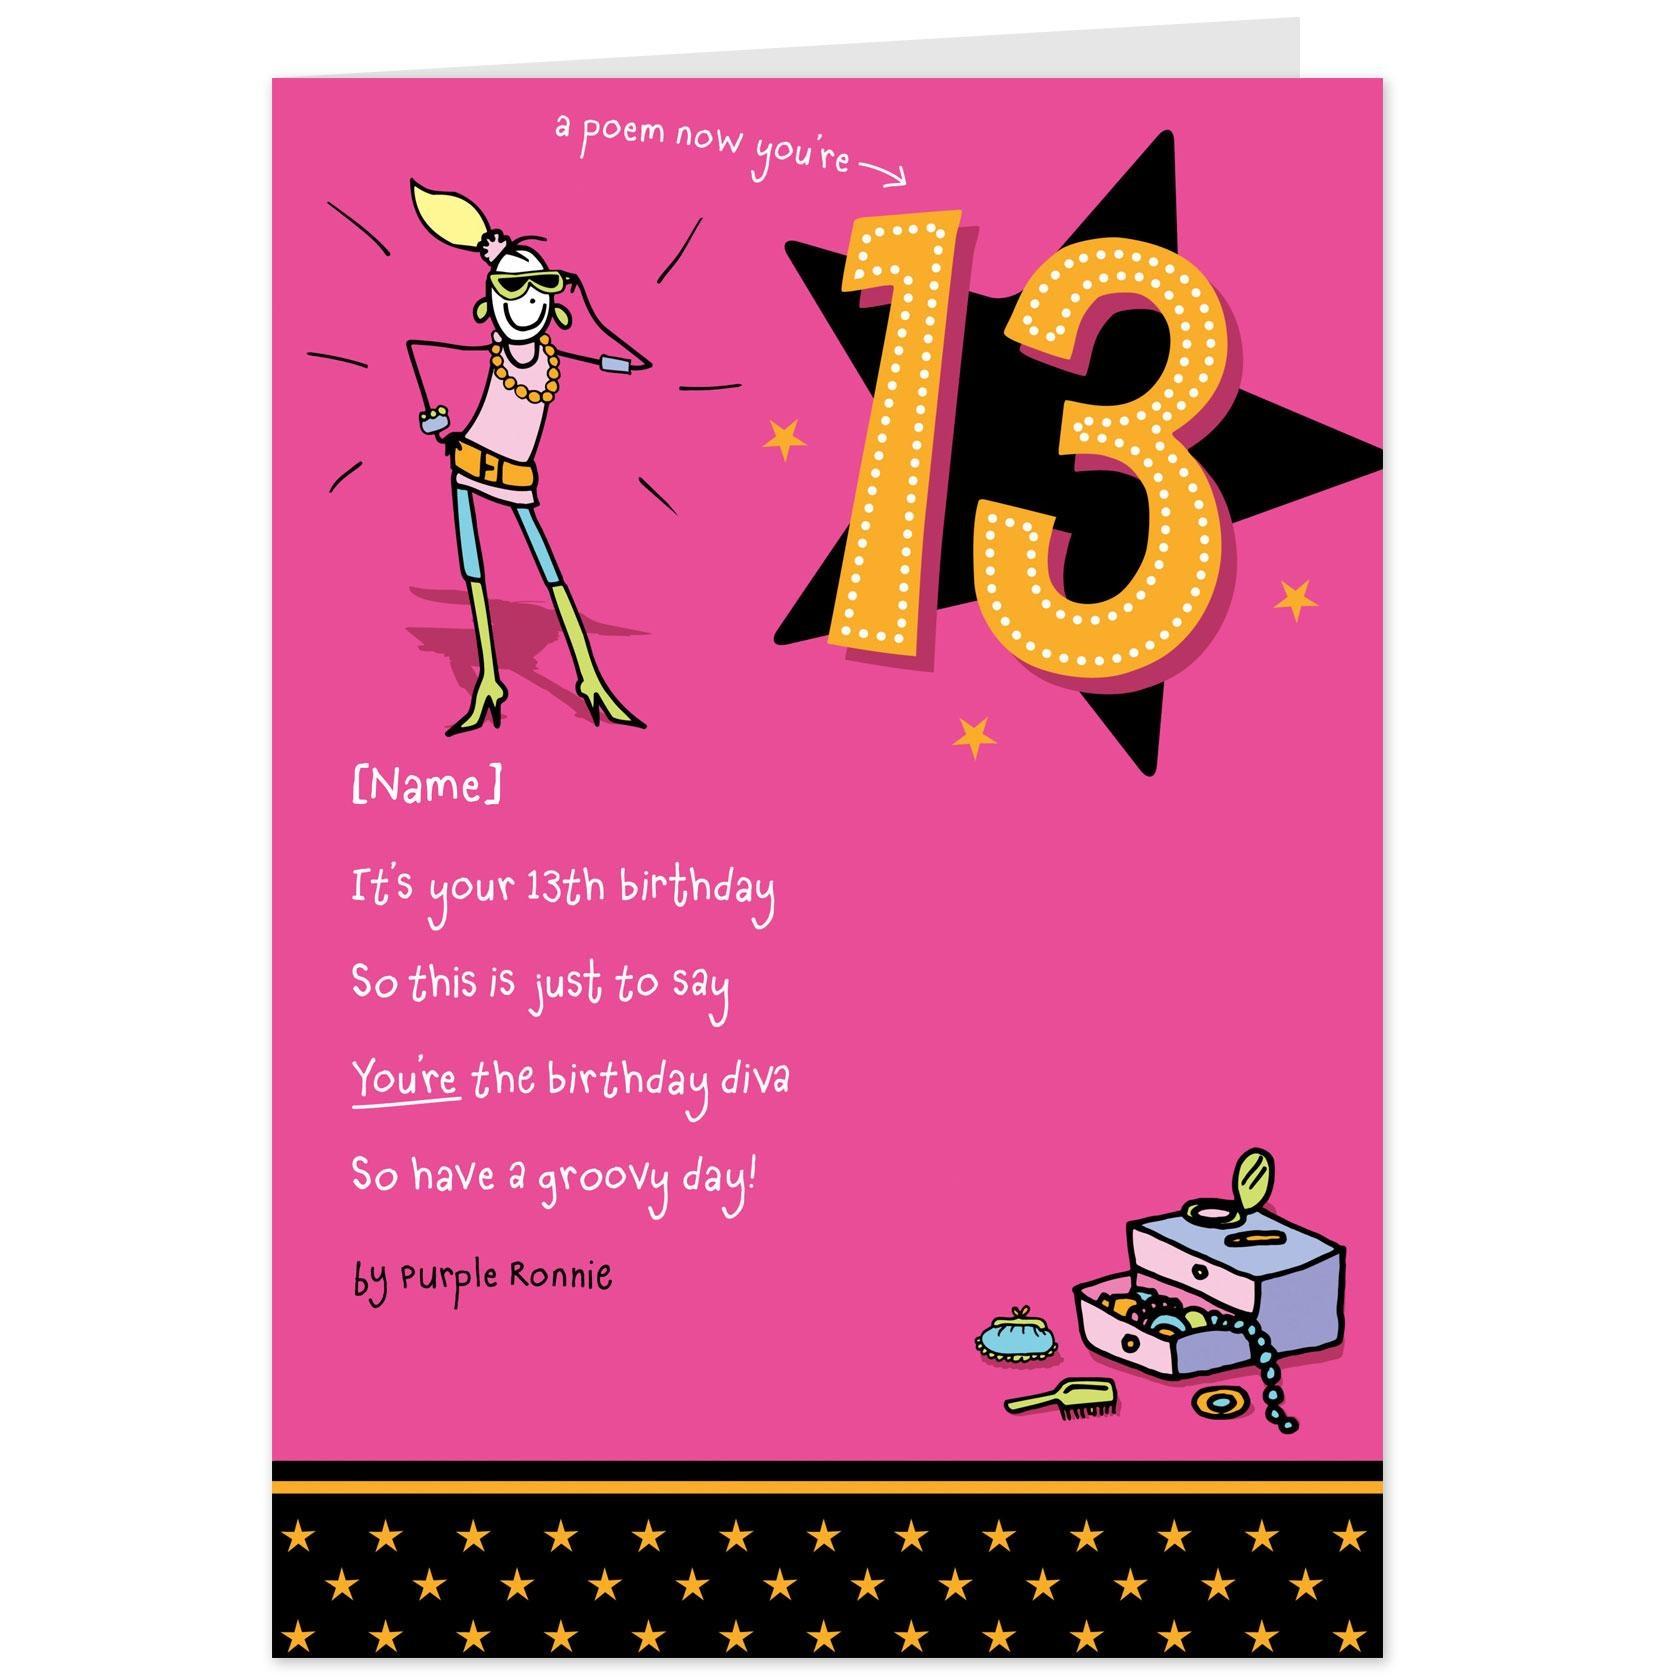 95+ 13Th Birthday Cards Printable Free - Free Birthday Card Template - 13Th Birthday Cards Printable Free